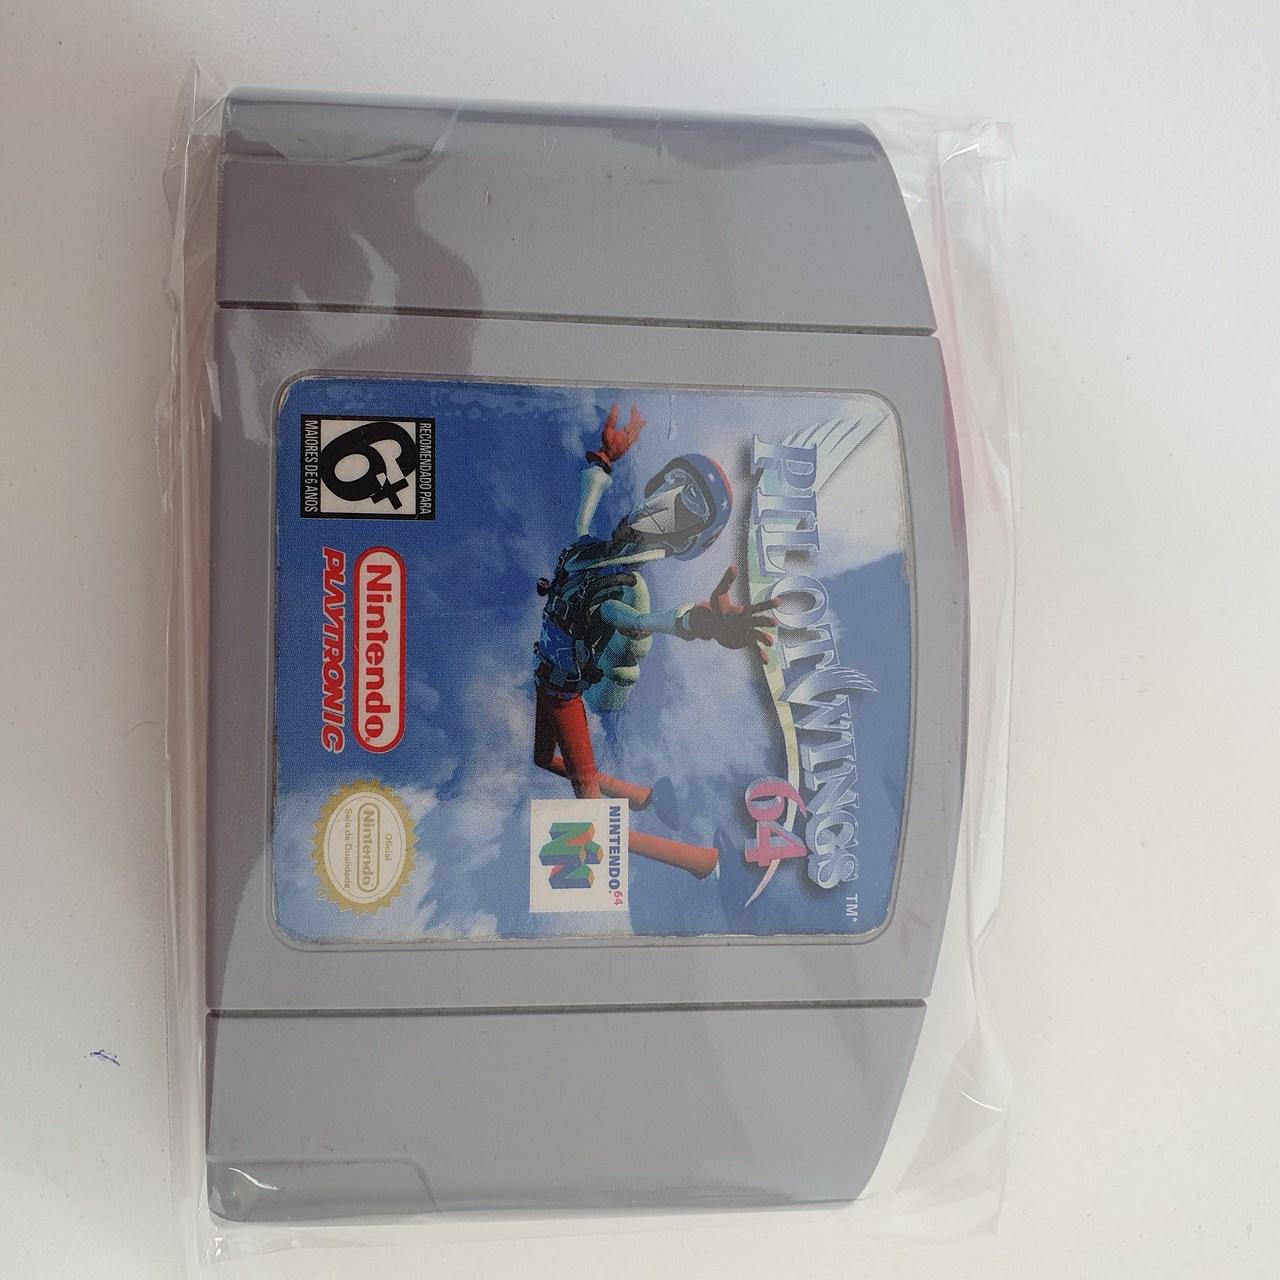 PilotWings 64 - Cartucho - Nintendo 64 - Usado